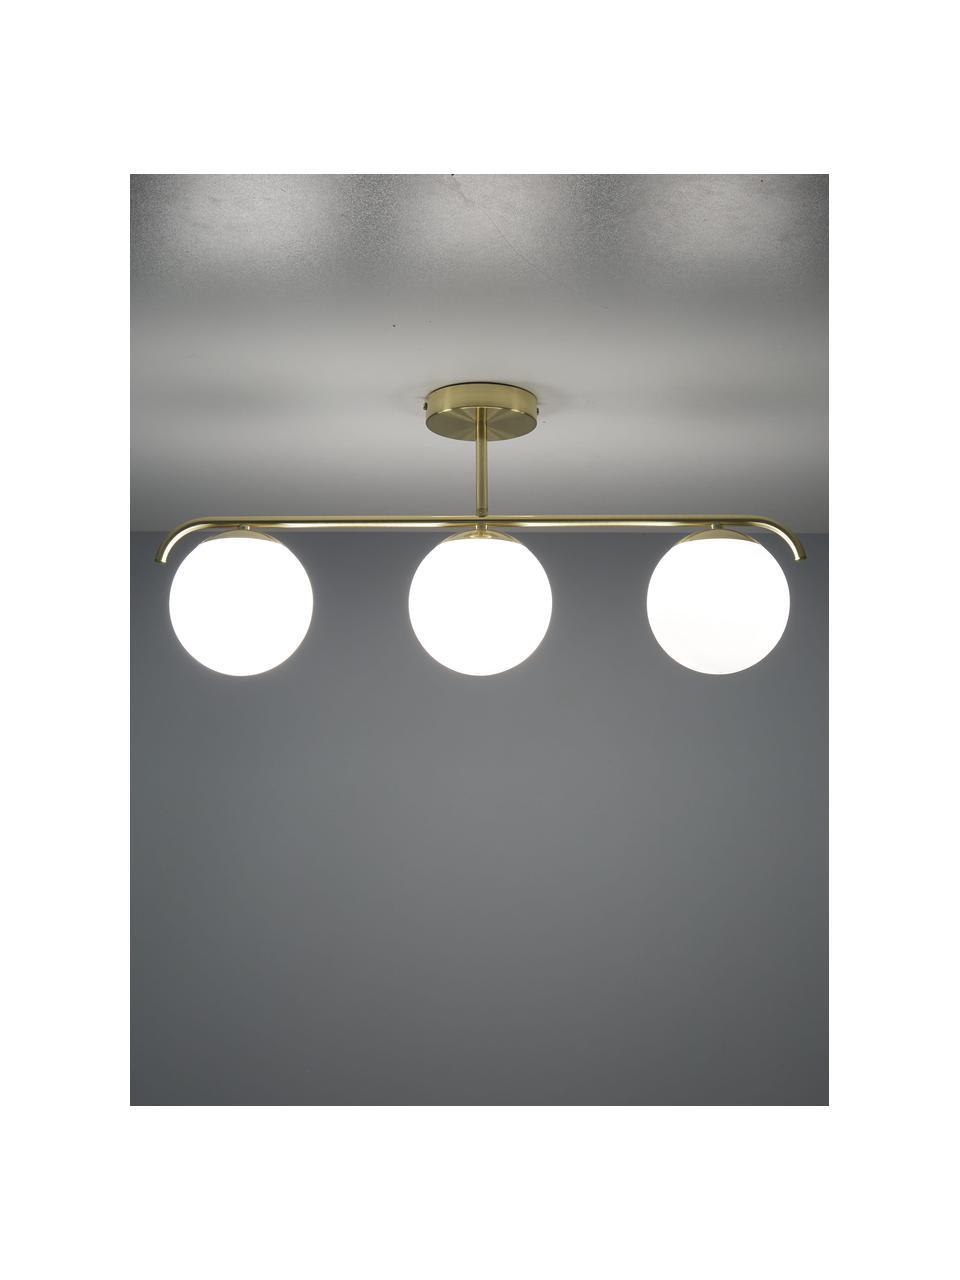 Deckenleuchte Grant aus Opalglas, Baldachin: Metall, beschichtet, Weiß, Messingfarben, 70 x 30 cm